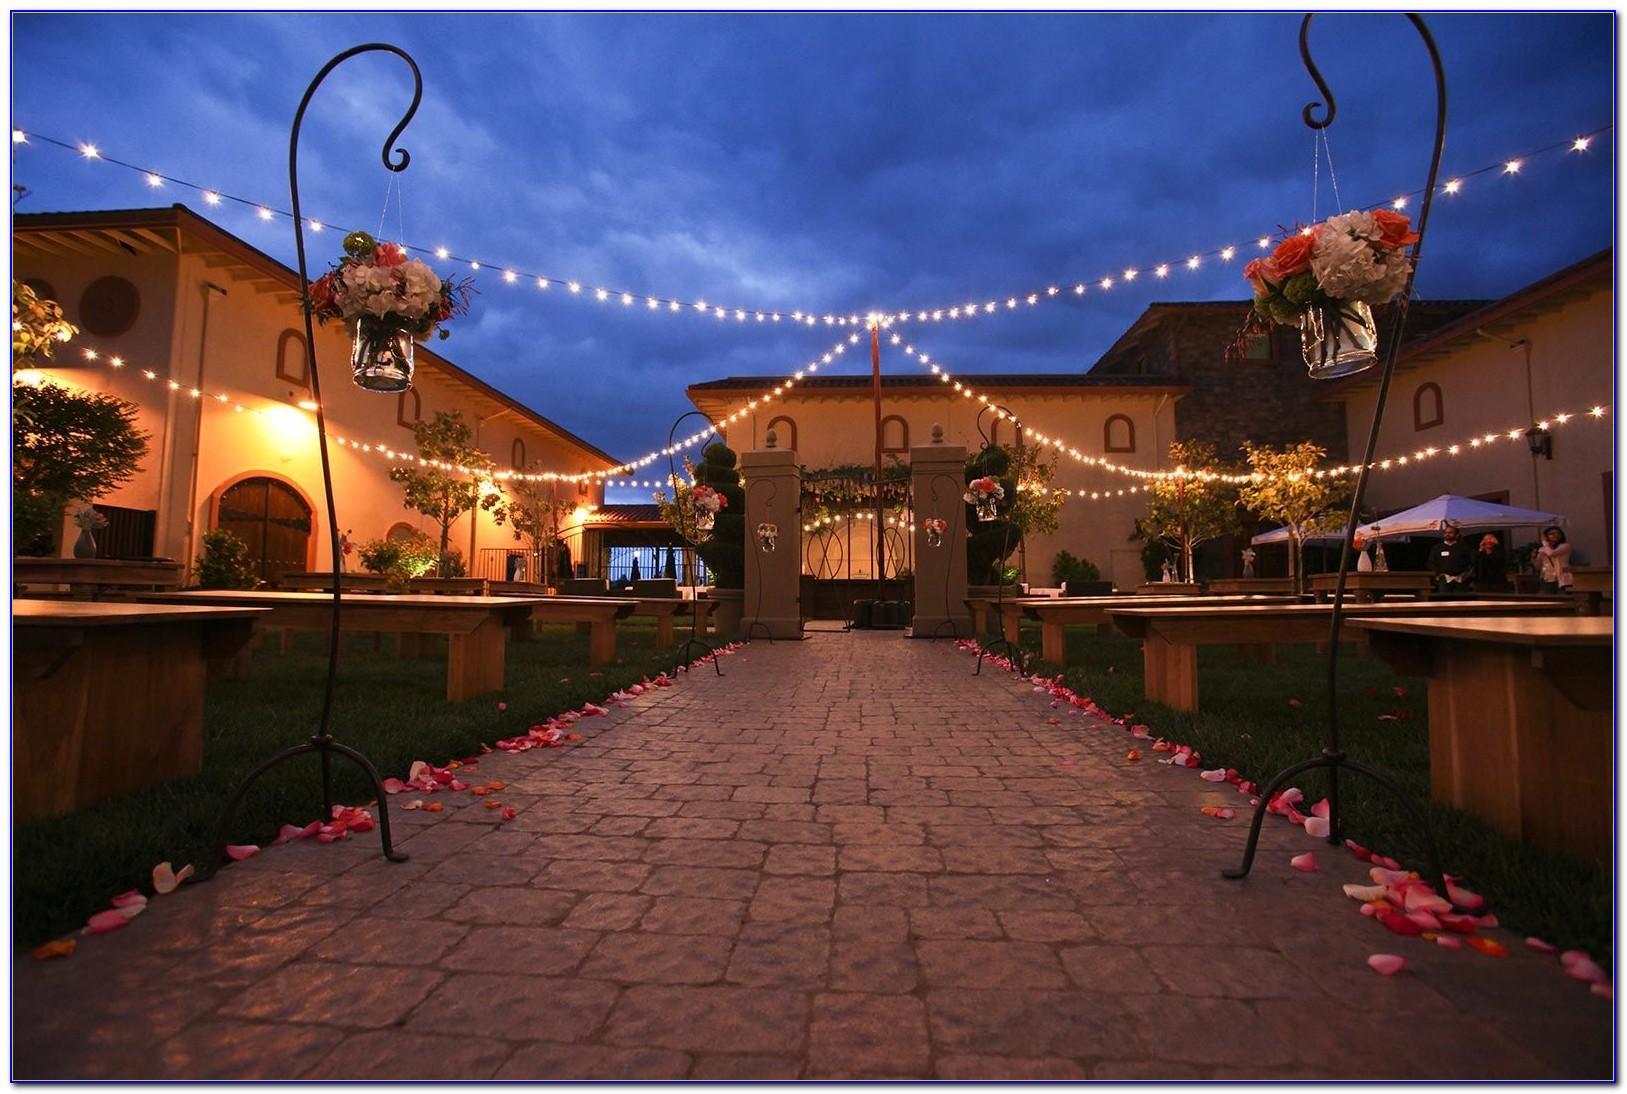 Restaurants Near Hilton Garden Inn Livermore Ca Garden Home Design Ideas R6dvrm4dmz52842